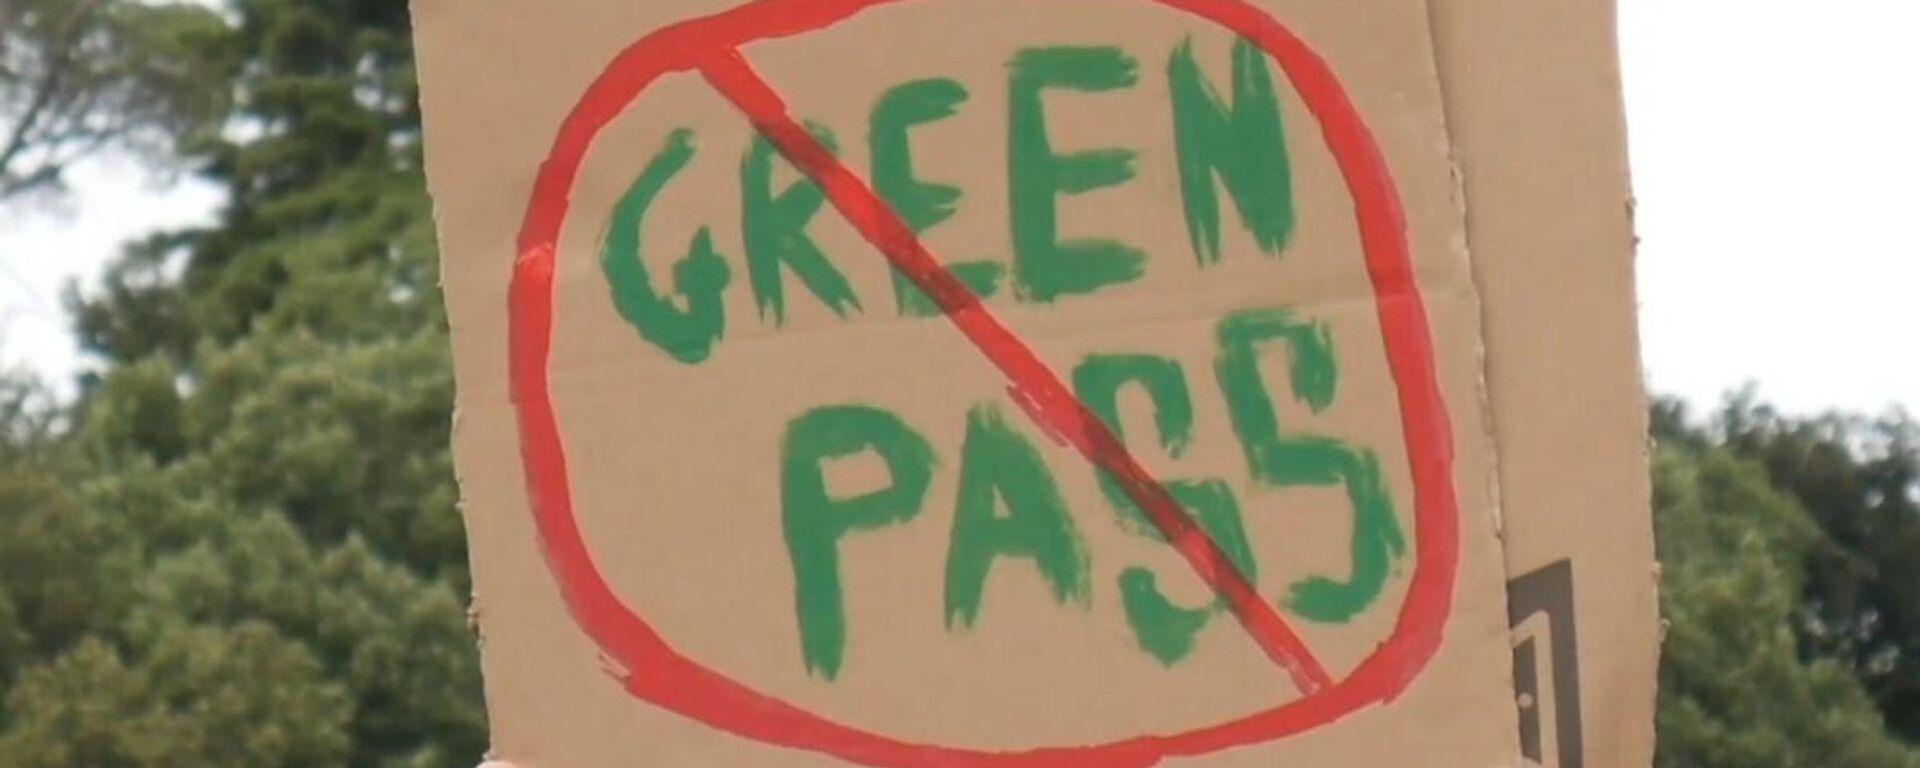 Protesta anti Green Pass a Roma - Sputnik Italia, 1920, 25.07.2021